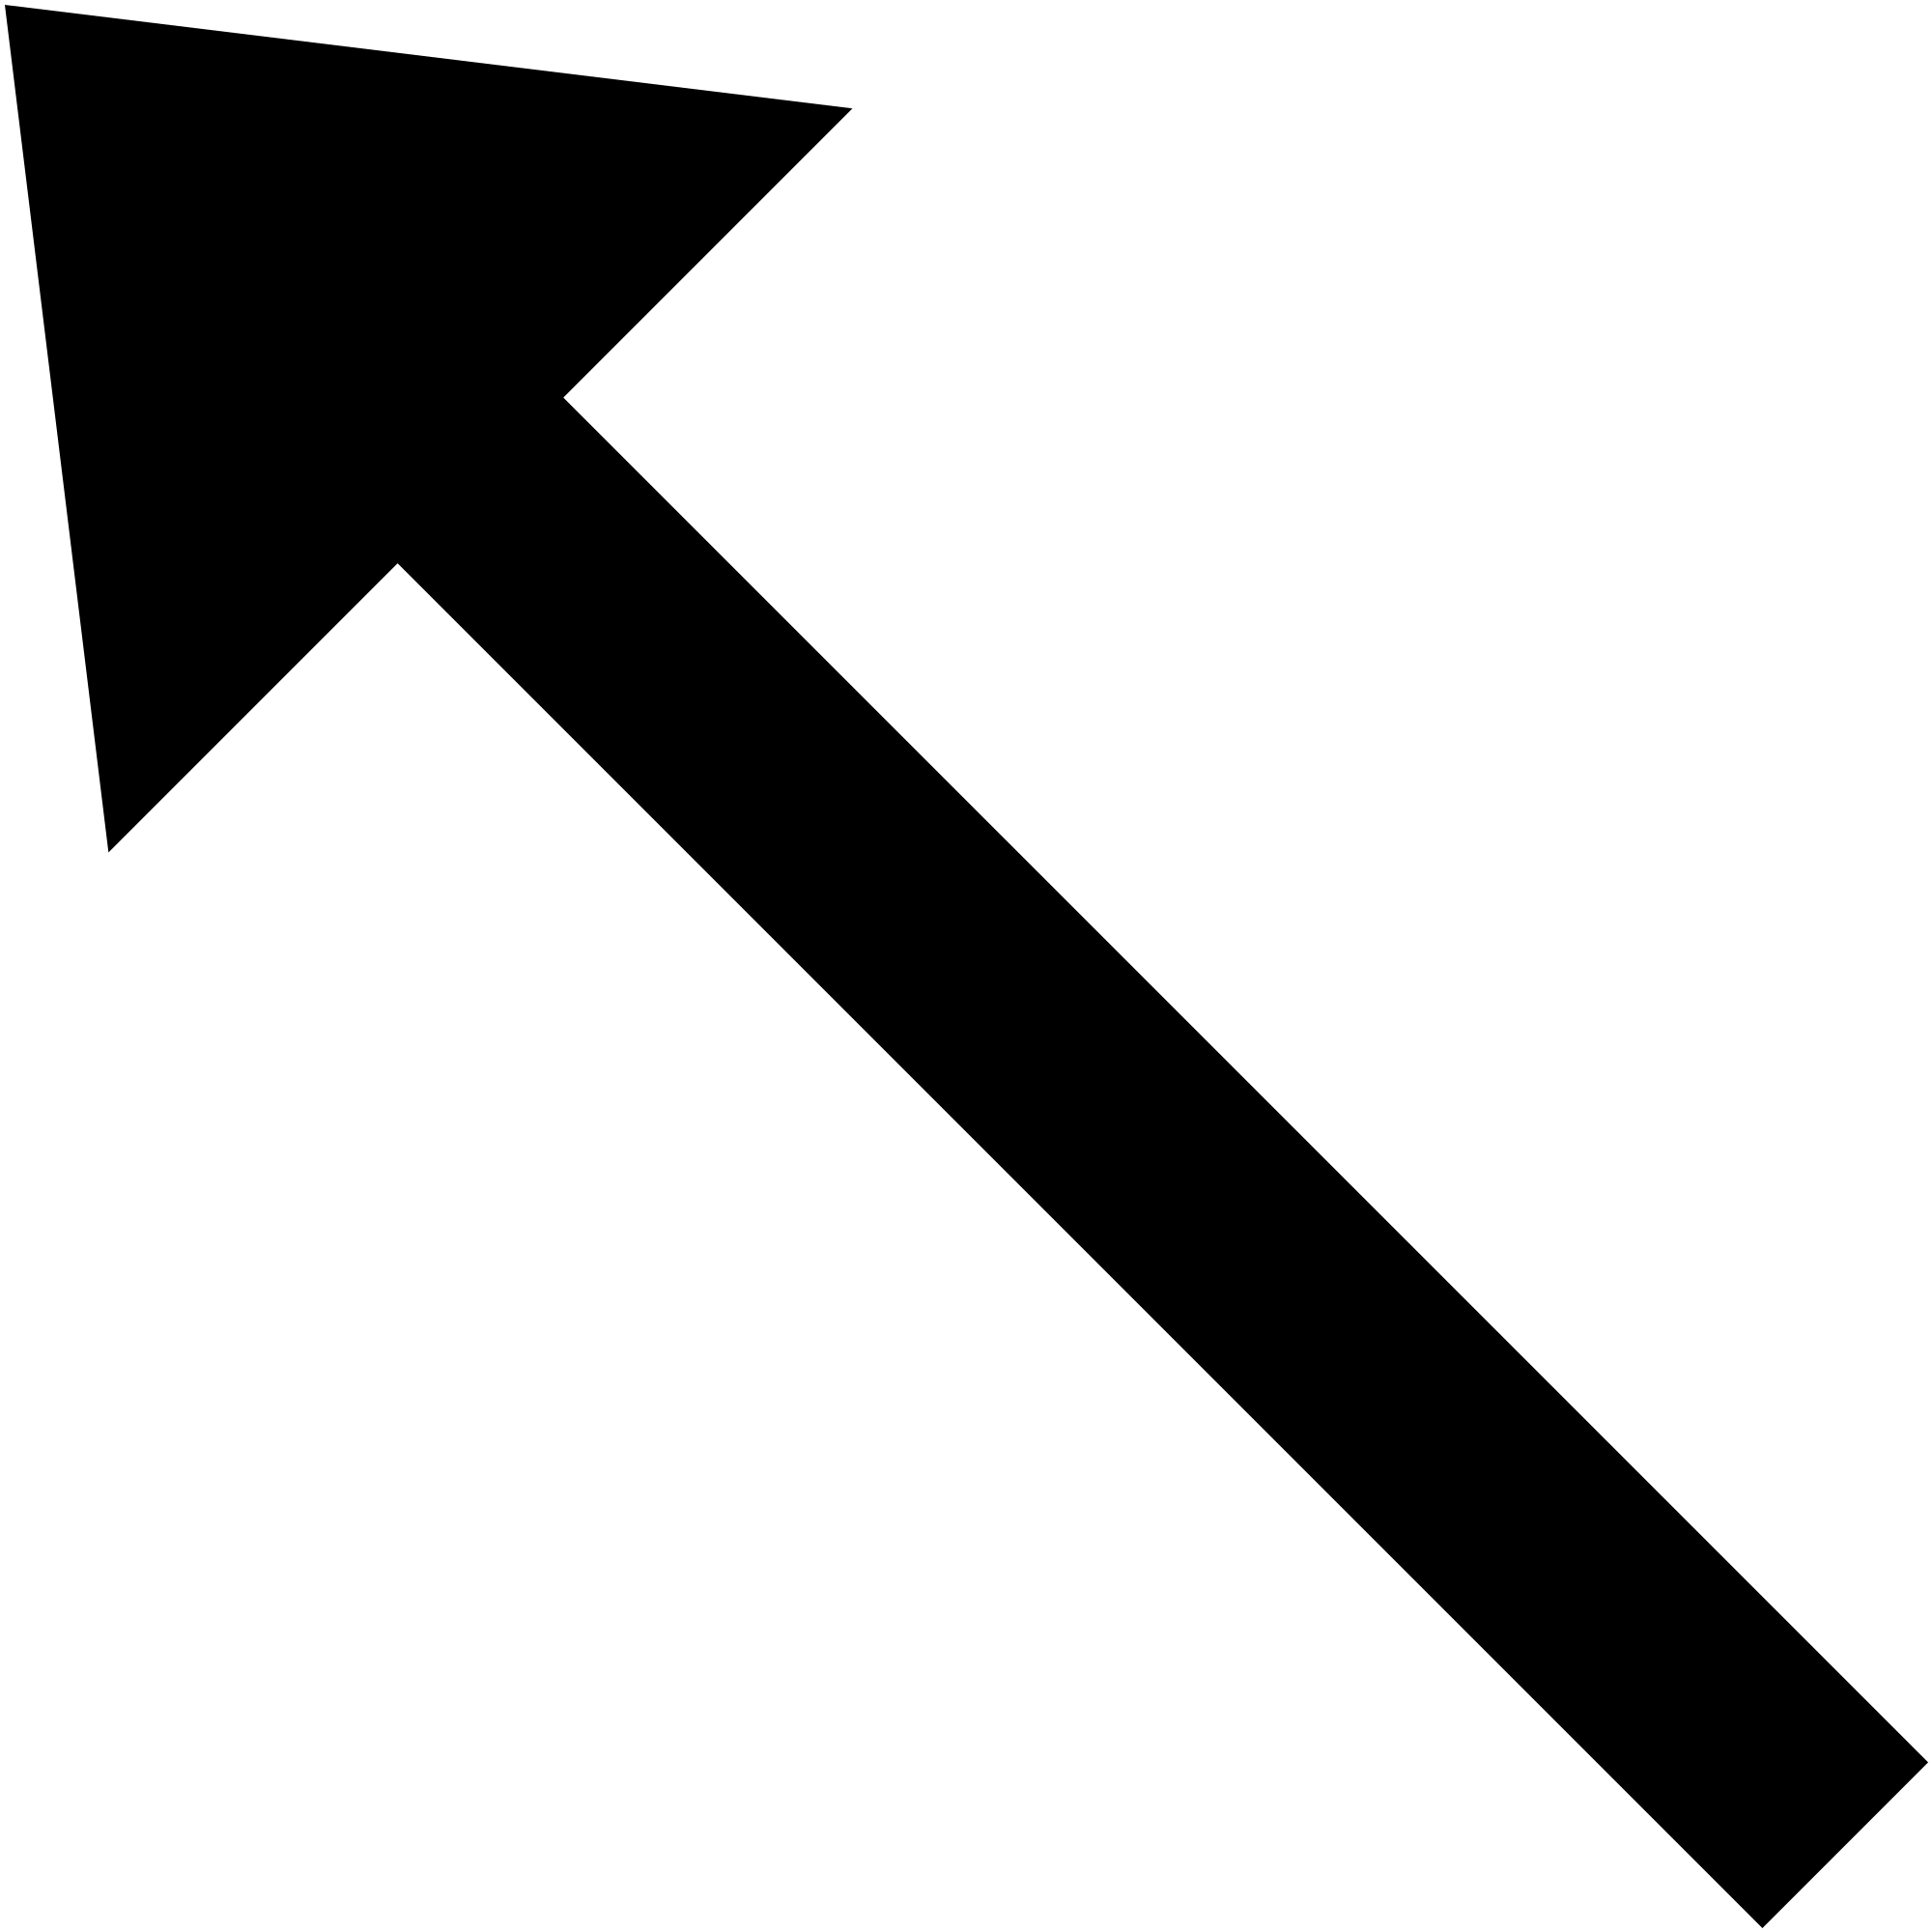 Arrow Computer Icons Clip art.